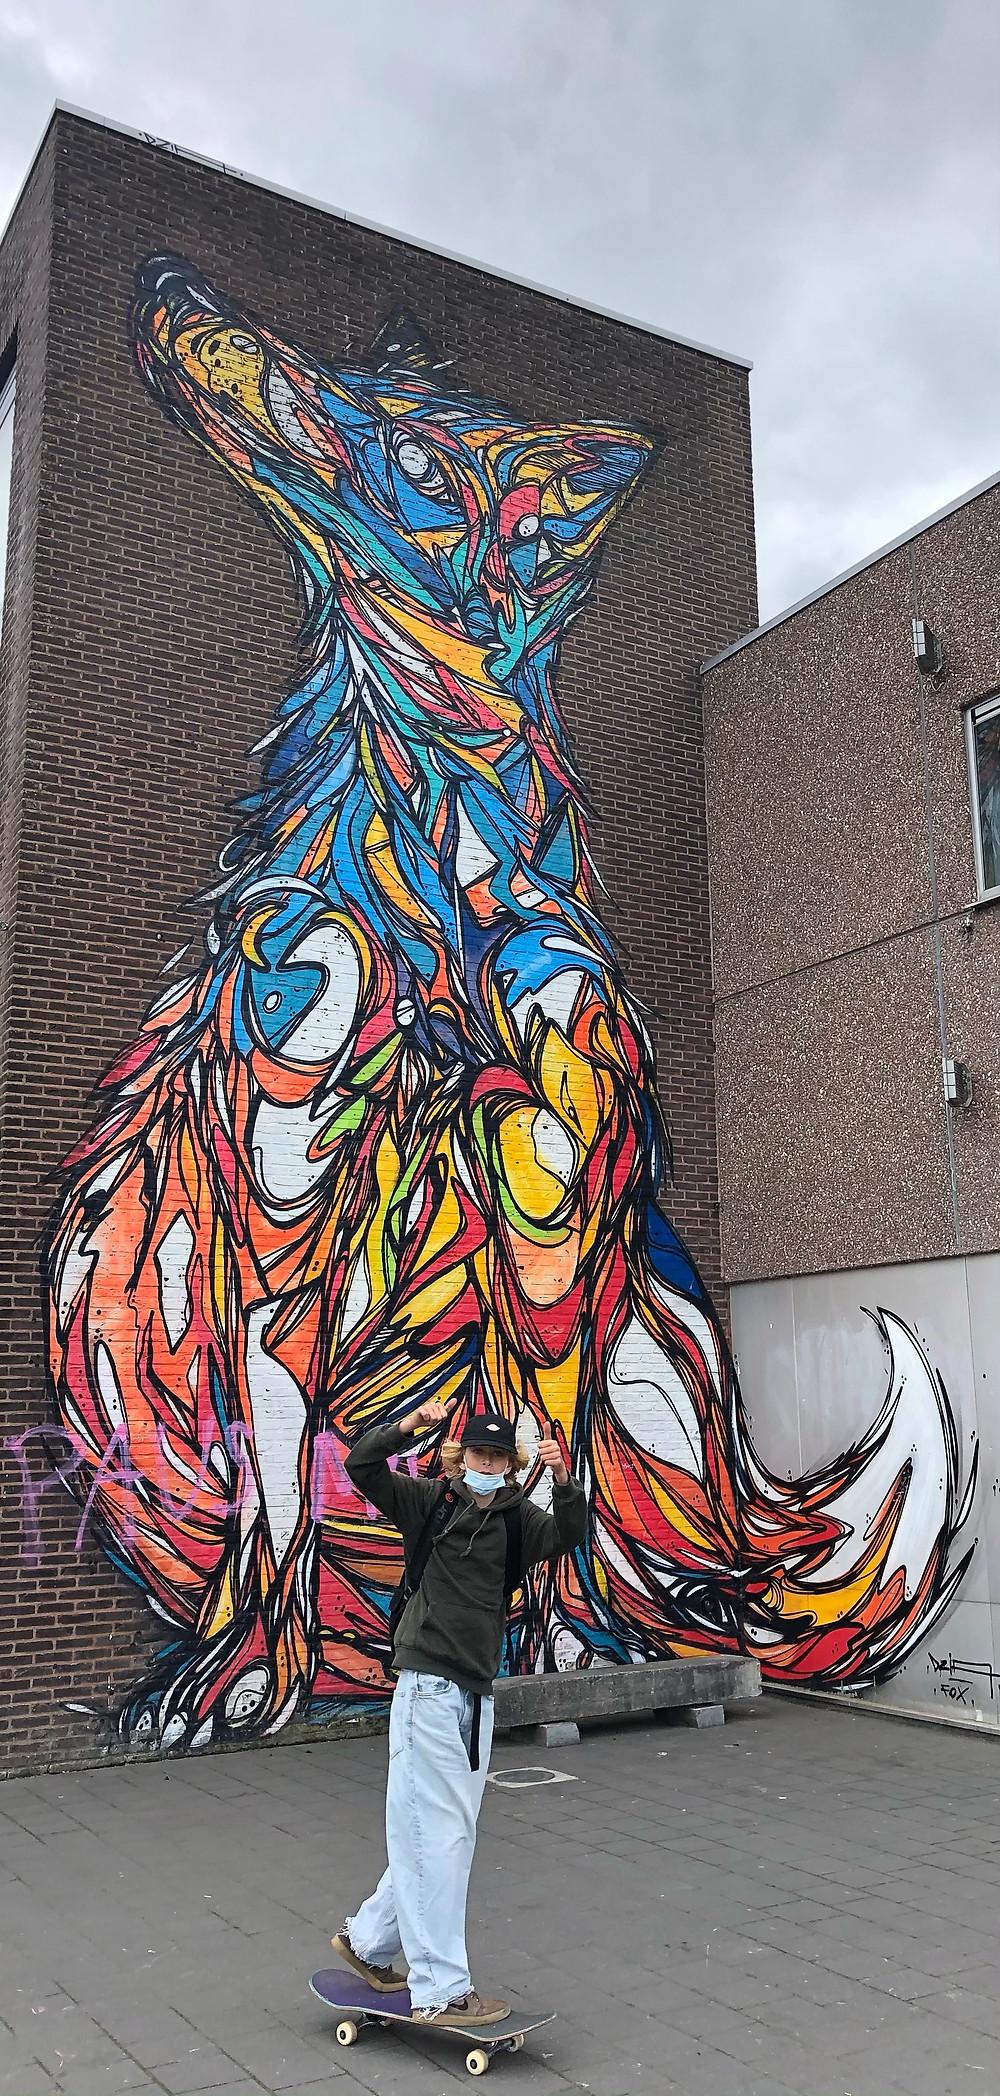 Fox by Dzia at Moevement Lier